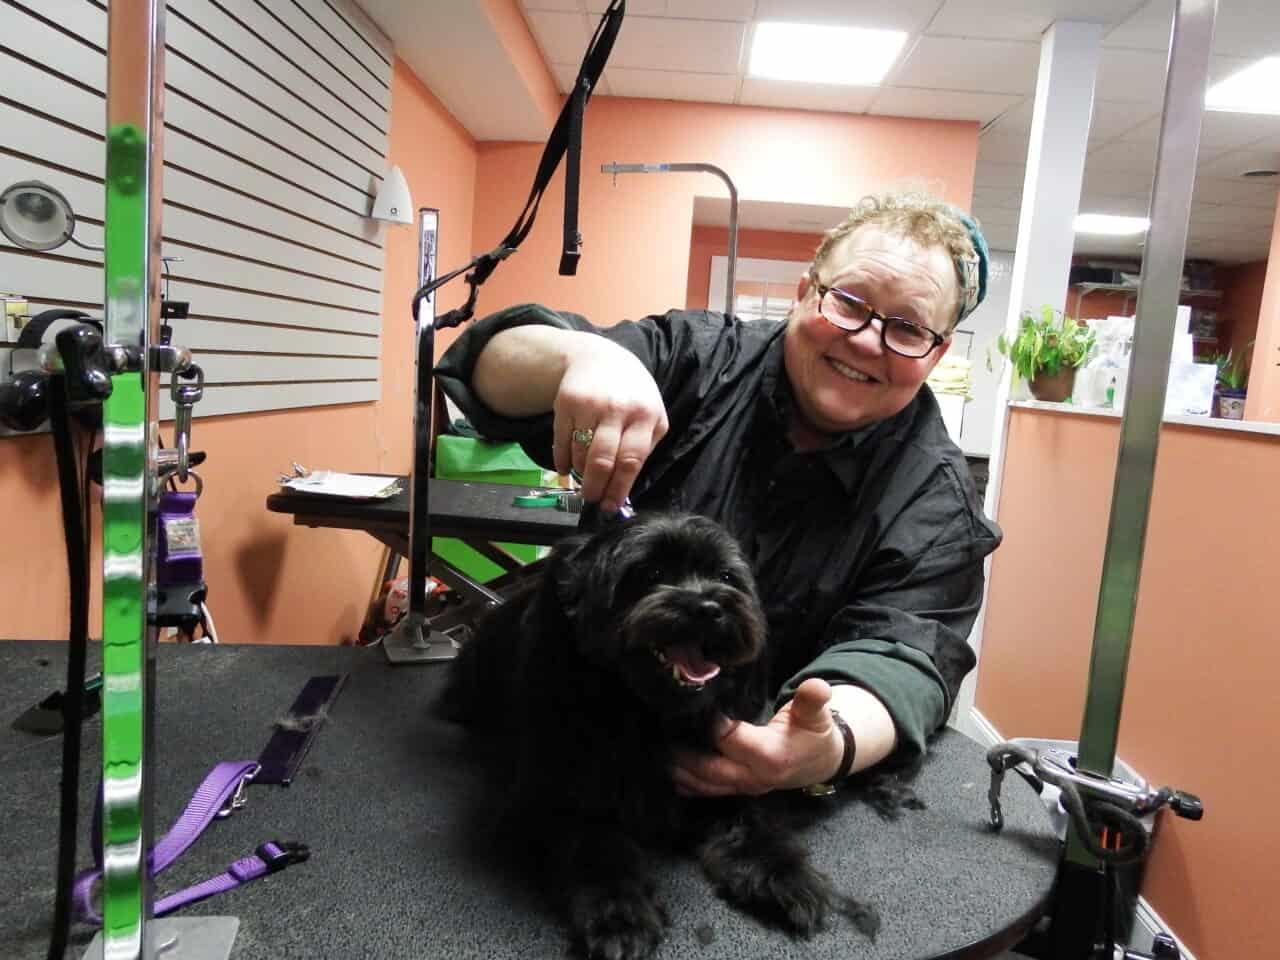 Sundance Lev at Grrreendog Grooming